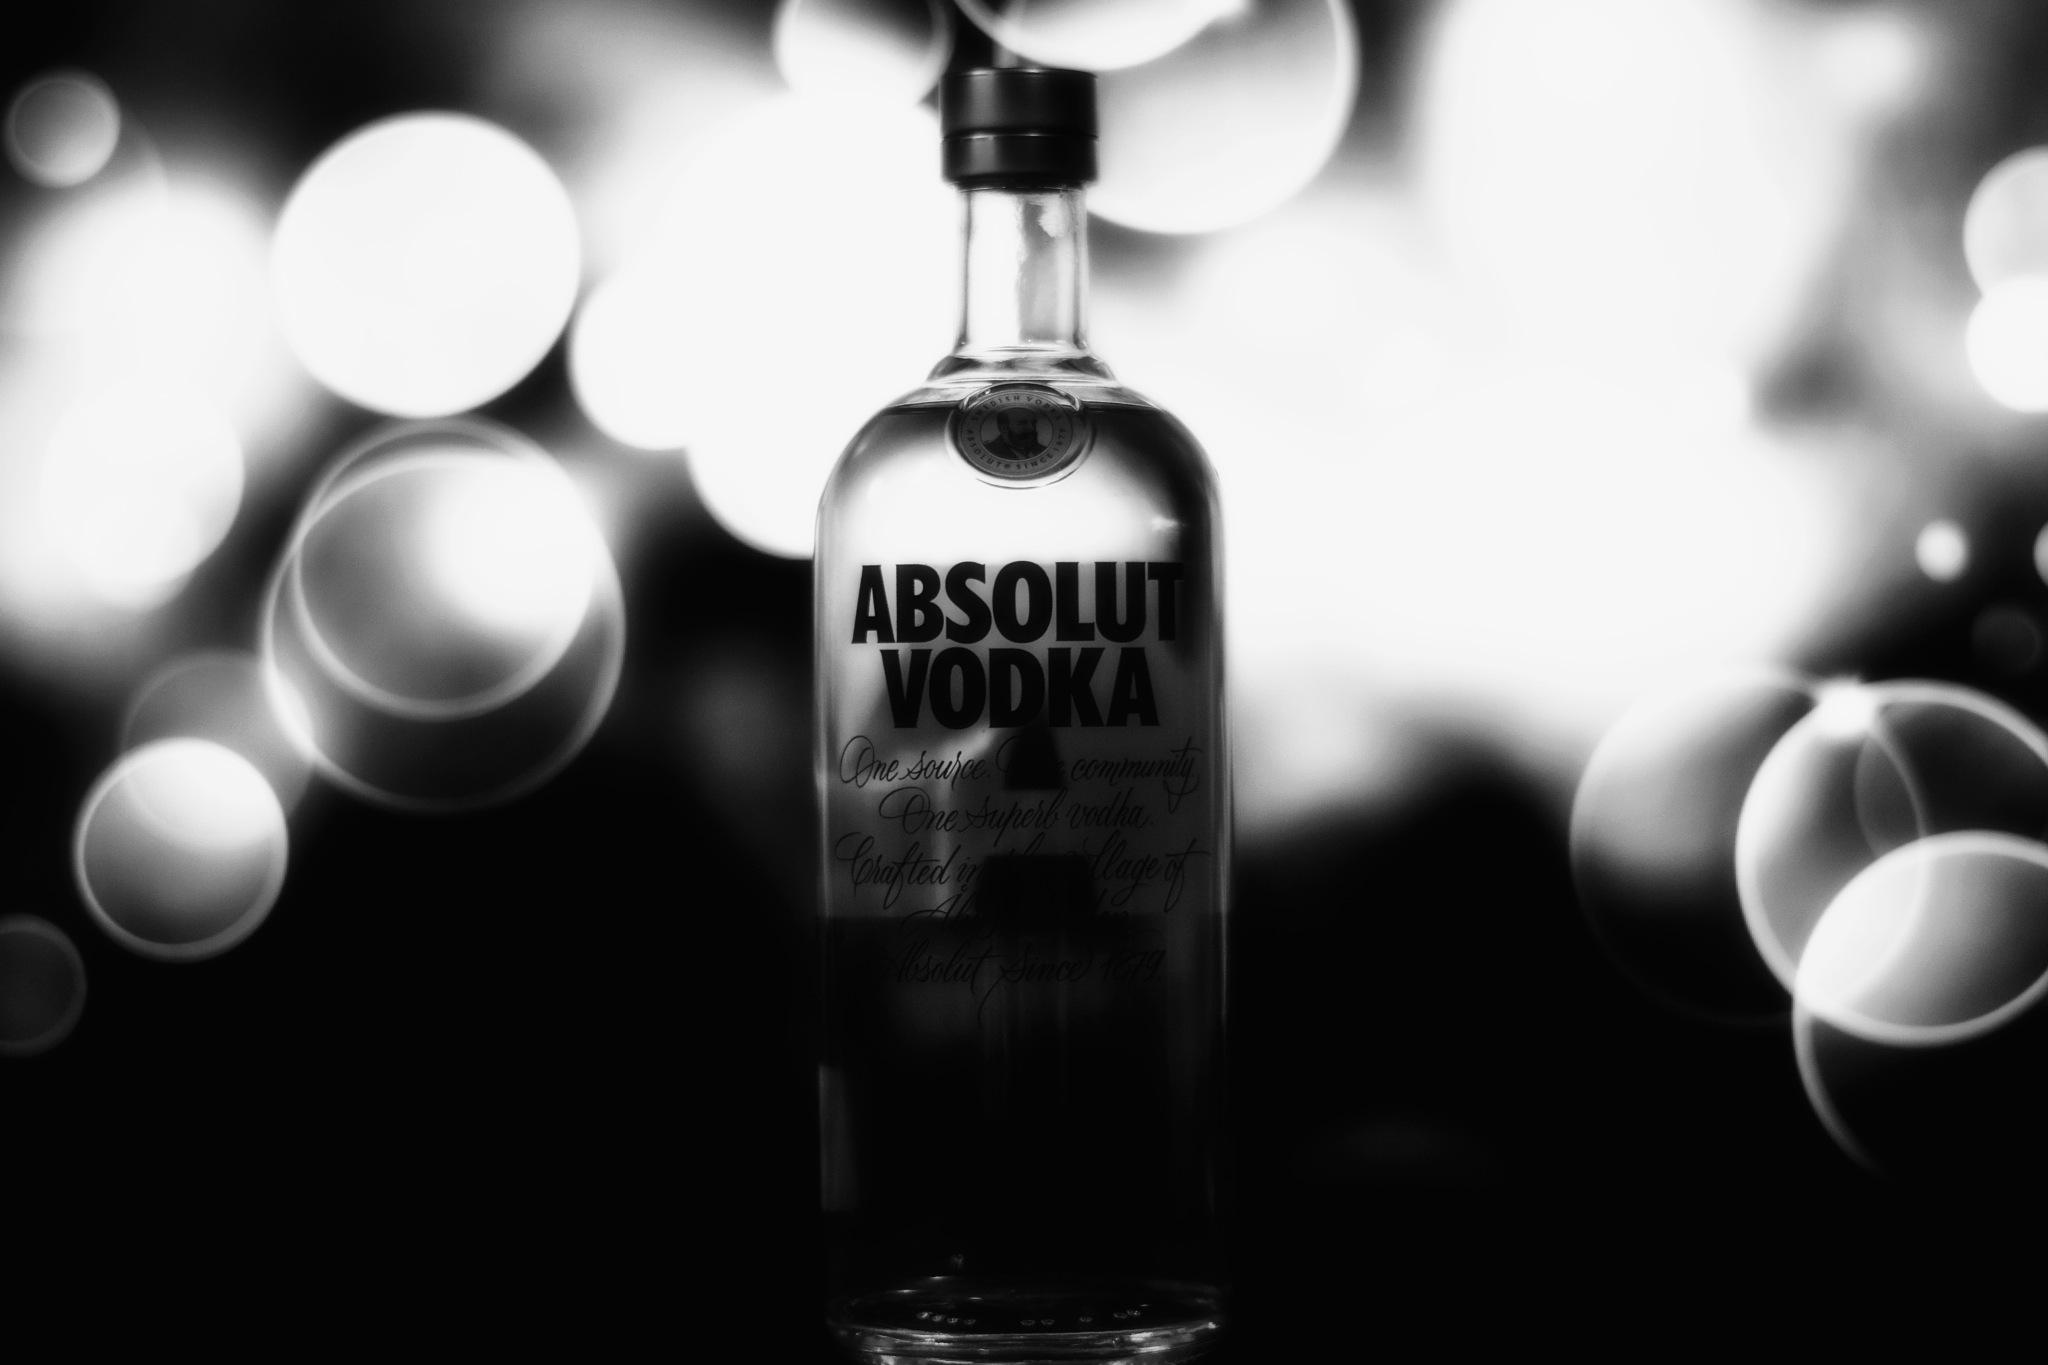 ABSOLUT Vodka by Joao Vanzzo